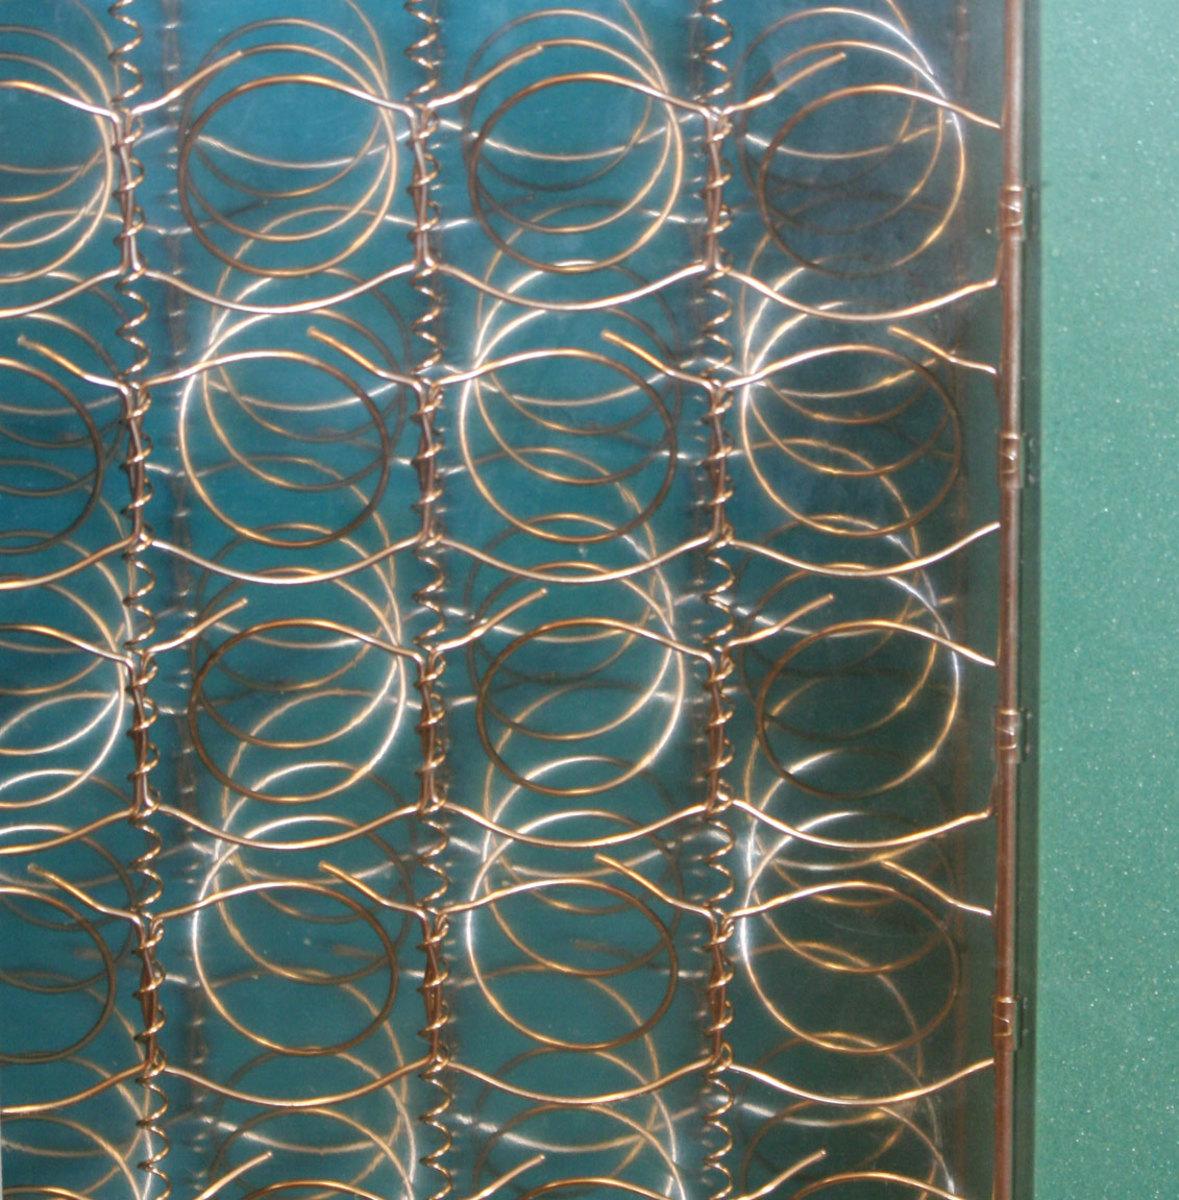 Alternating Offset Innerspring Coil System